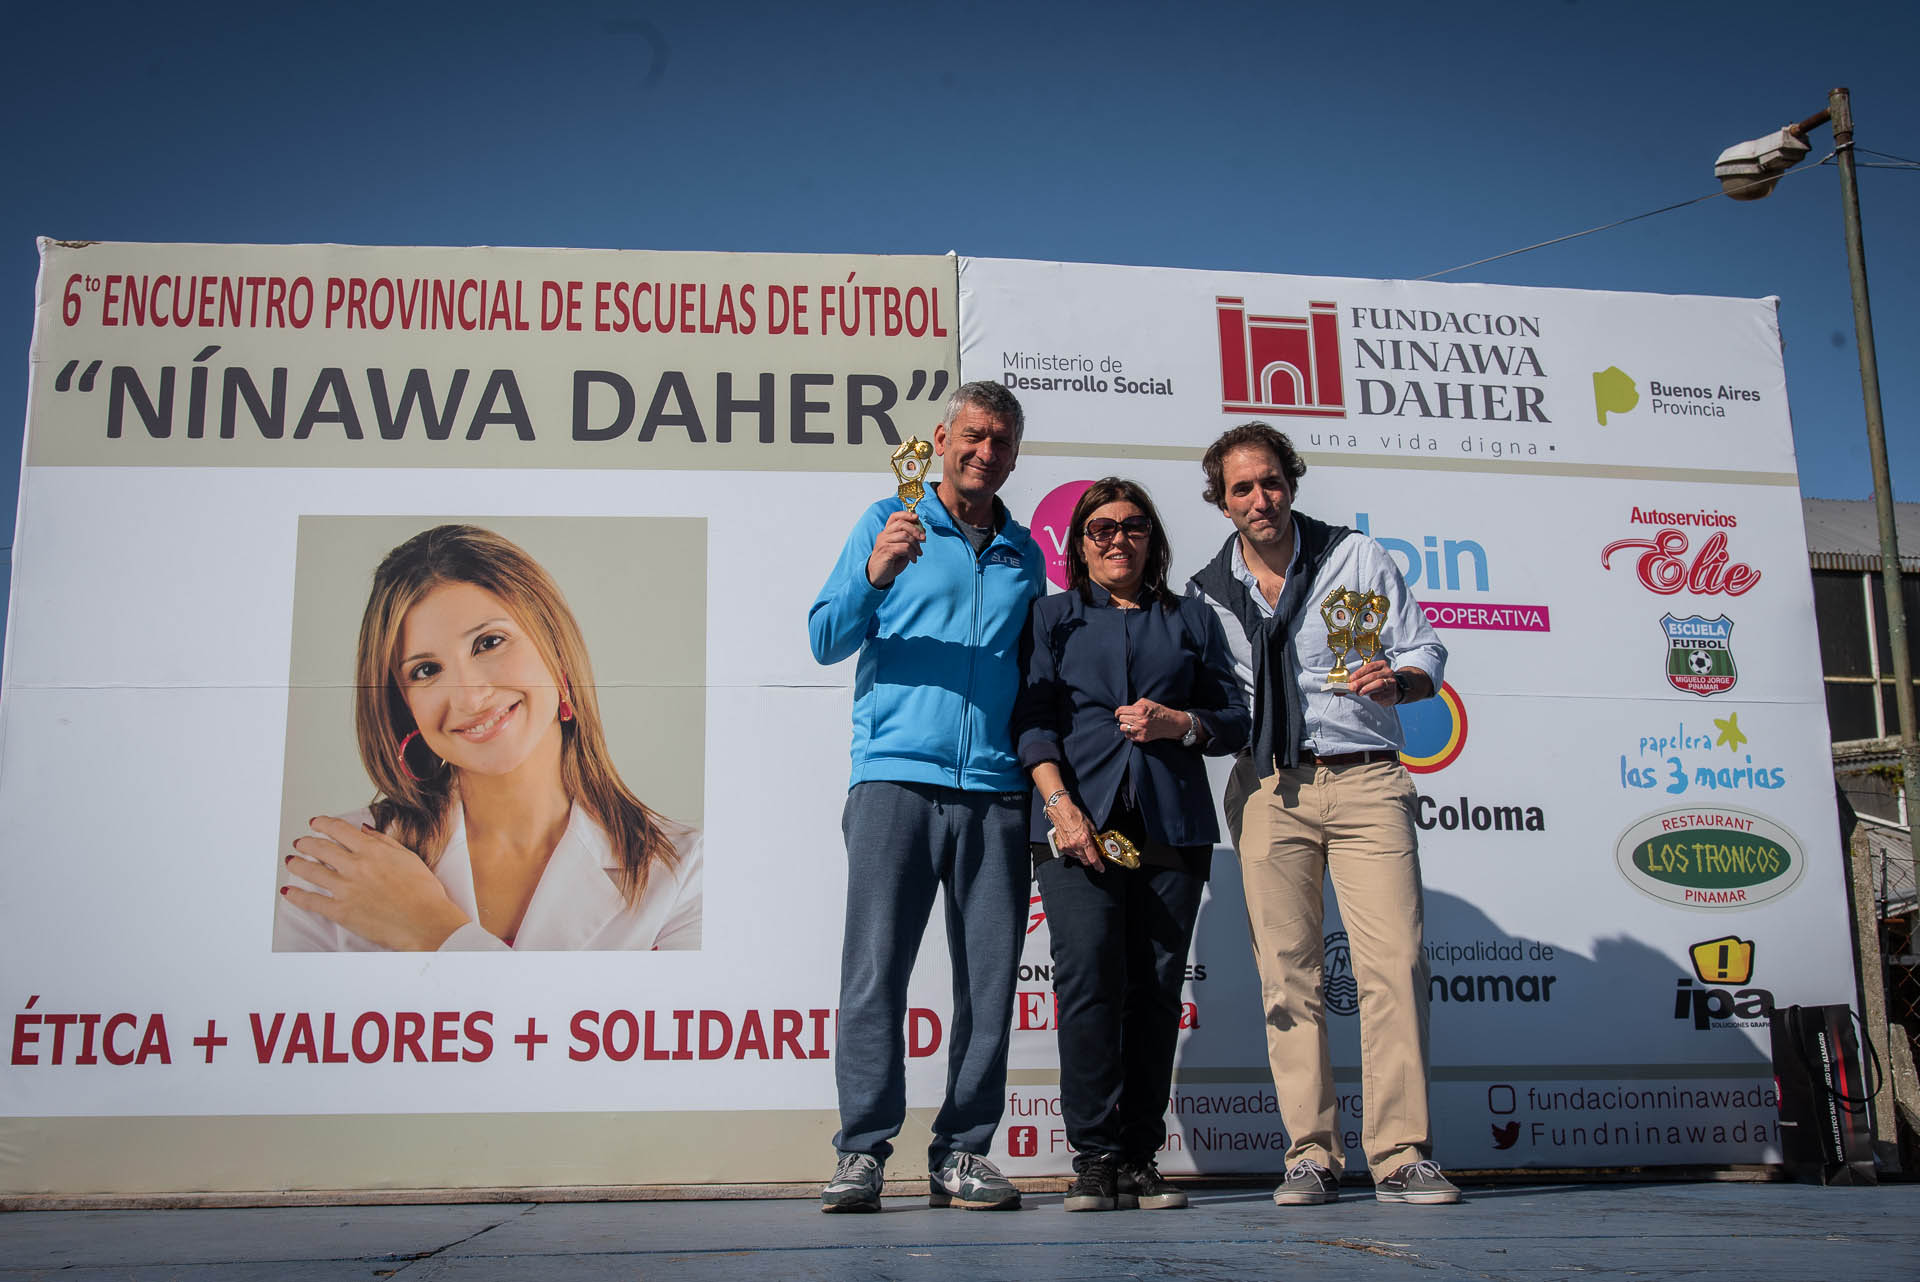 (Fundación Nínawa Daher)